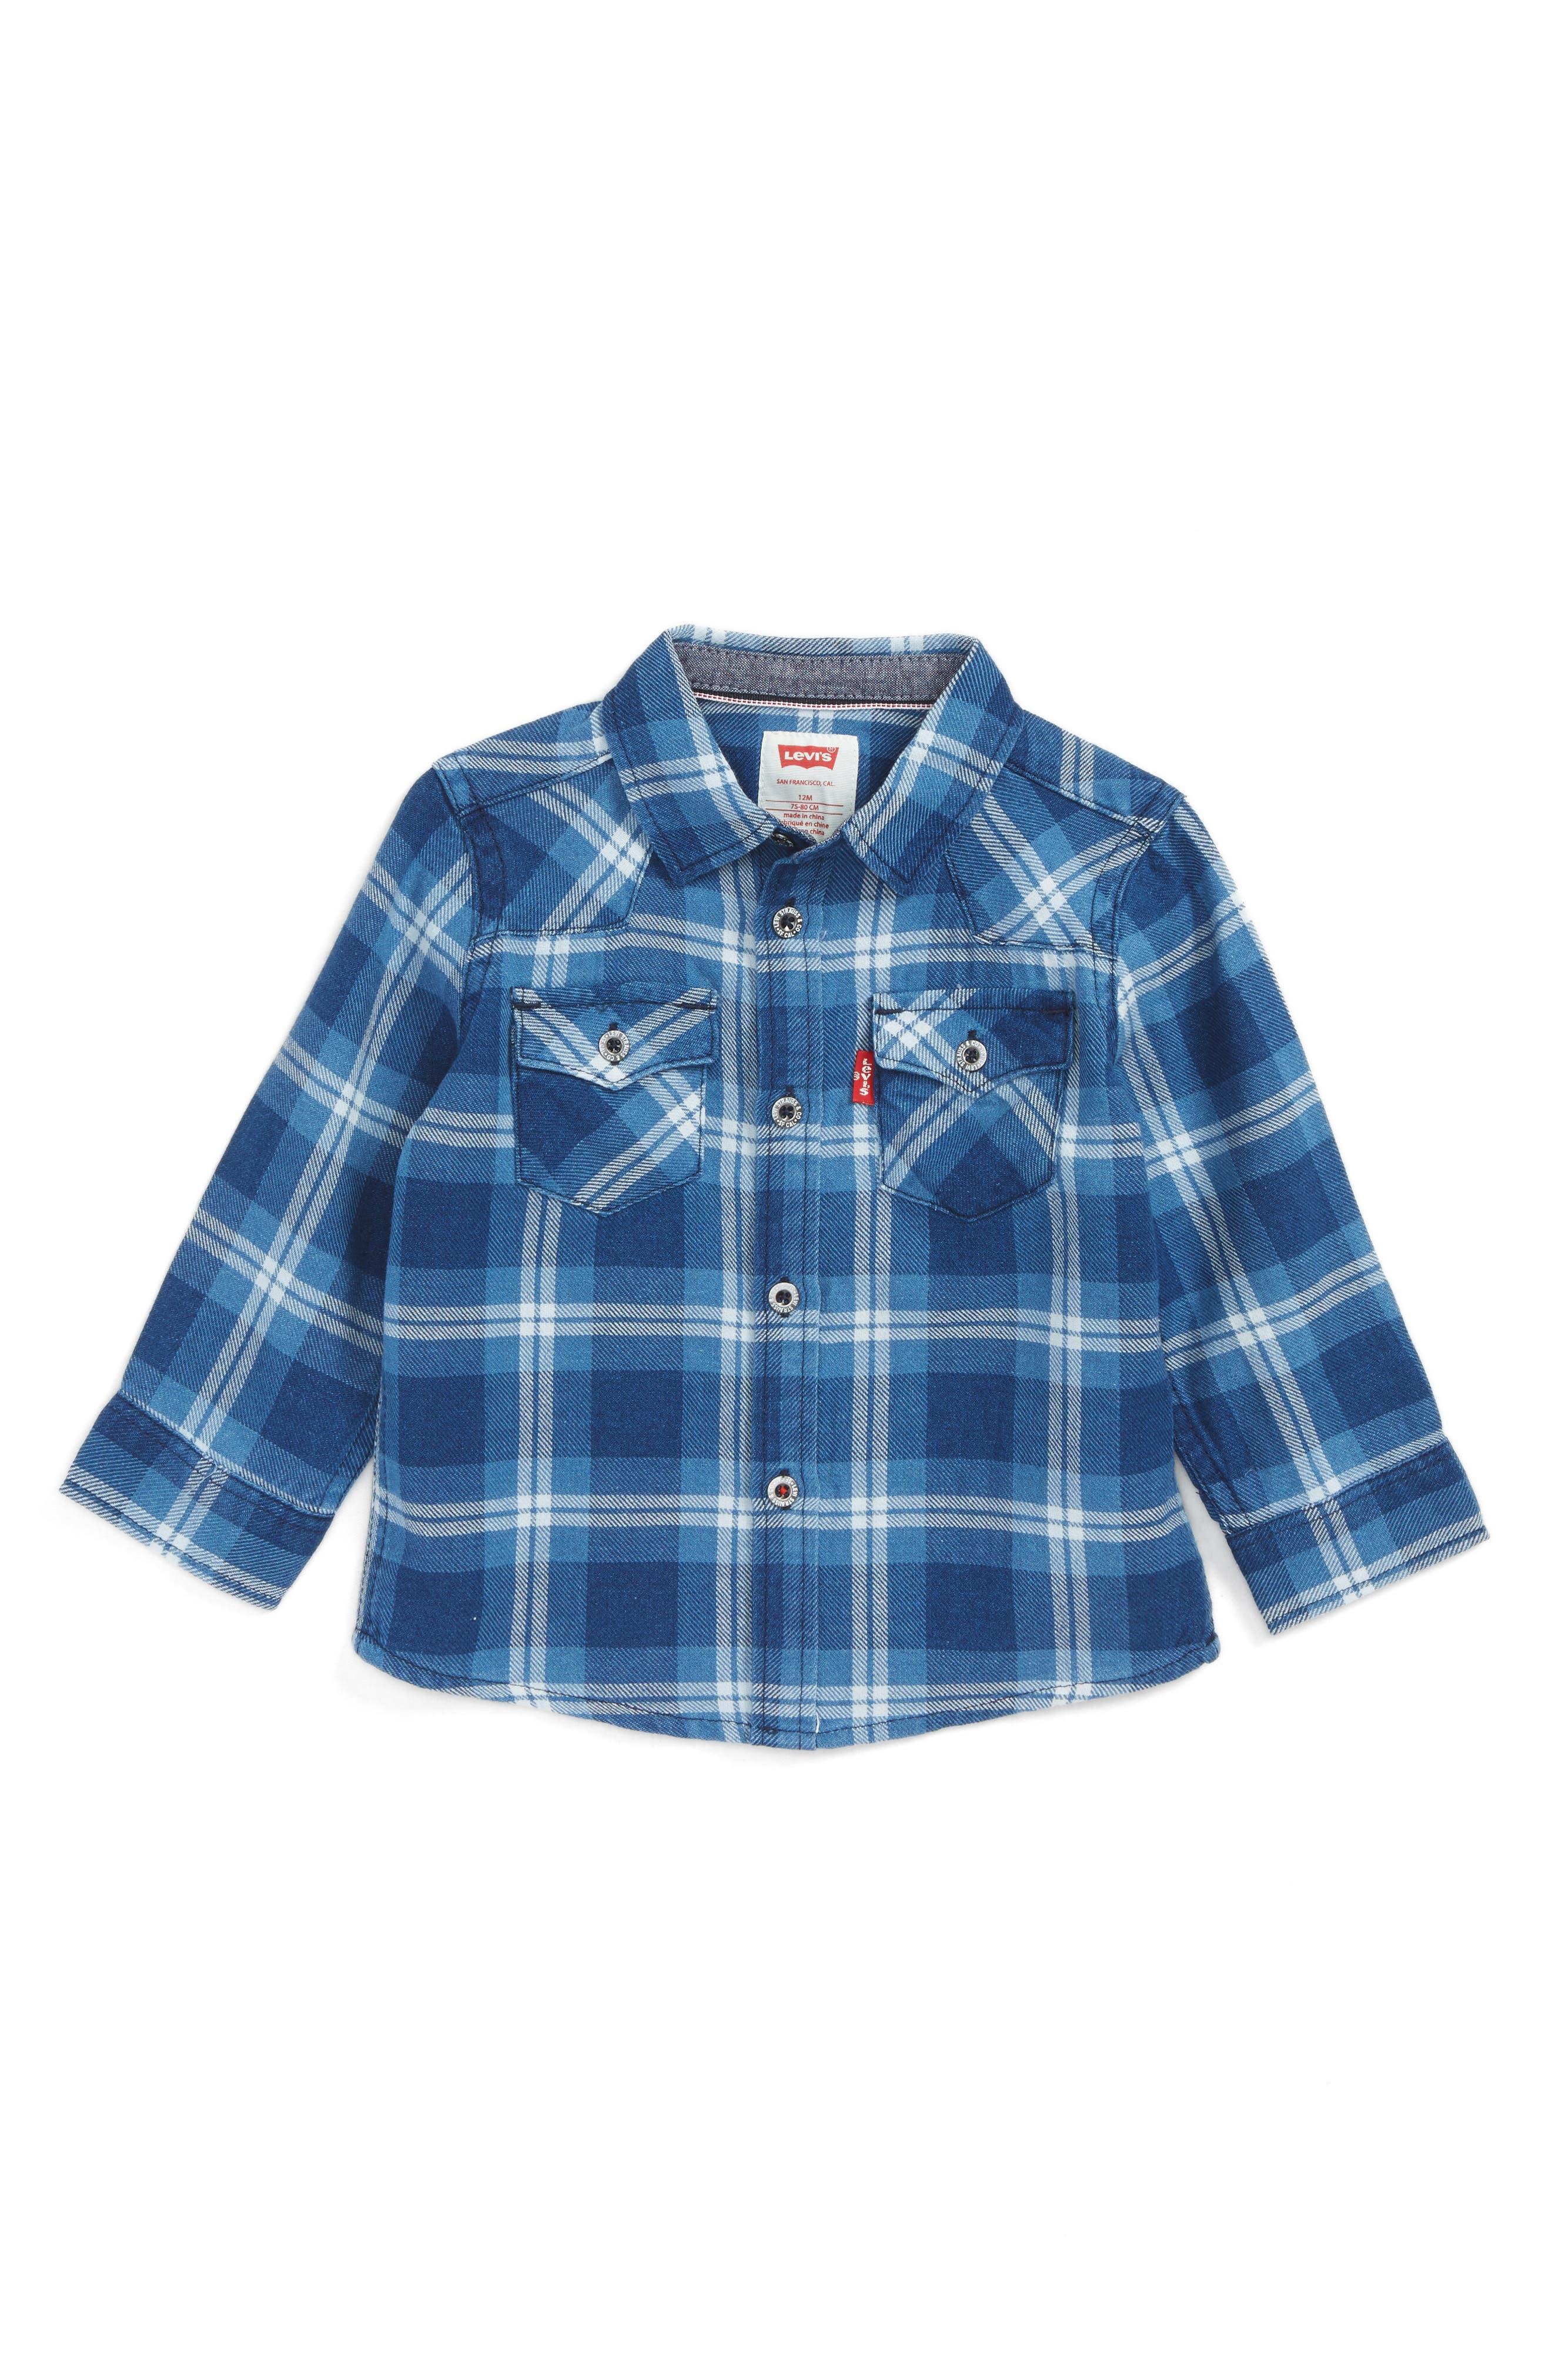 Barstow Plaid Shirt,                         Main,                         color, Blue/ Marshmallow